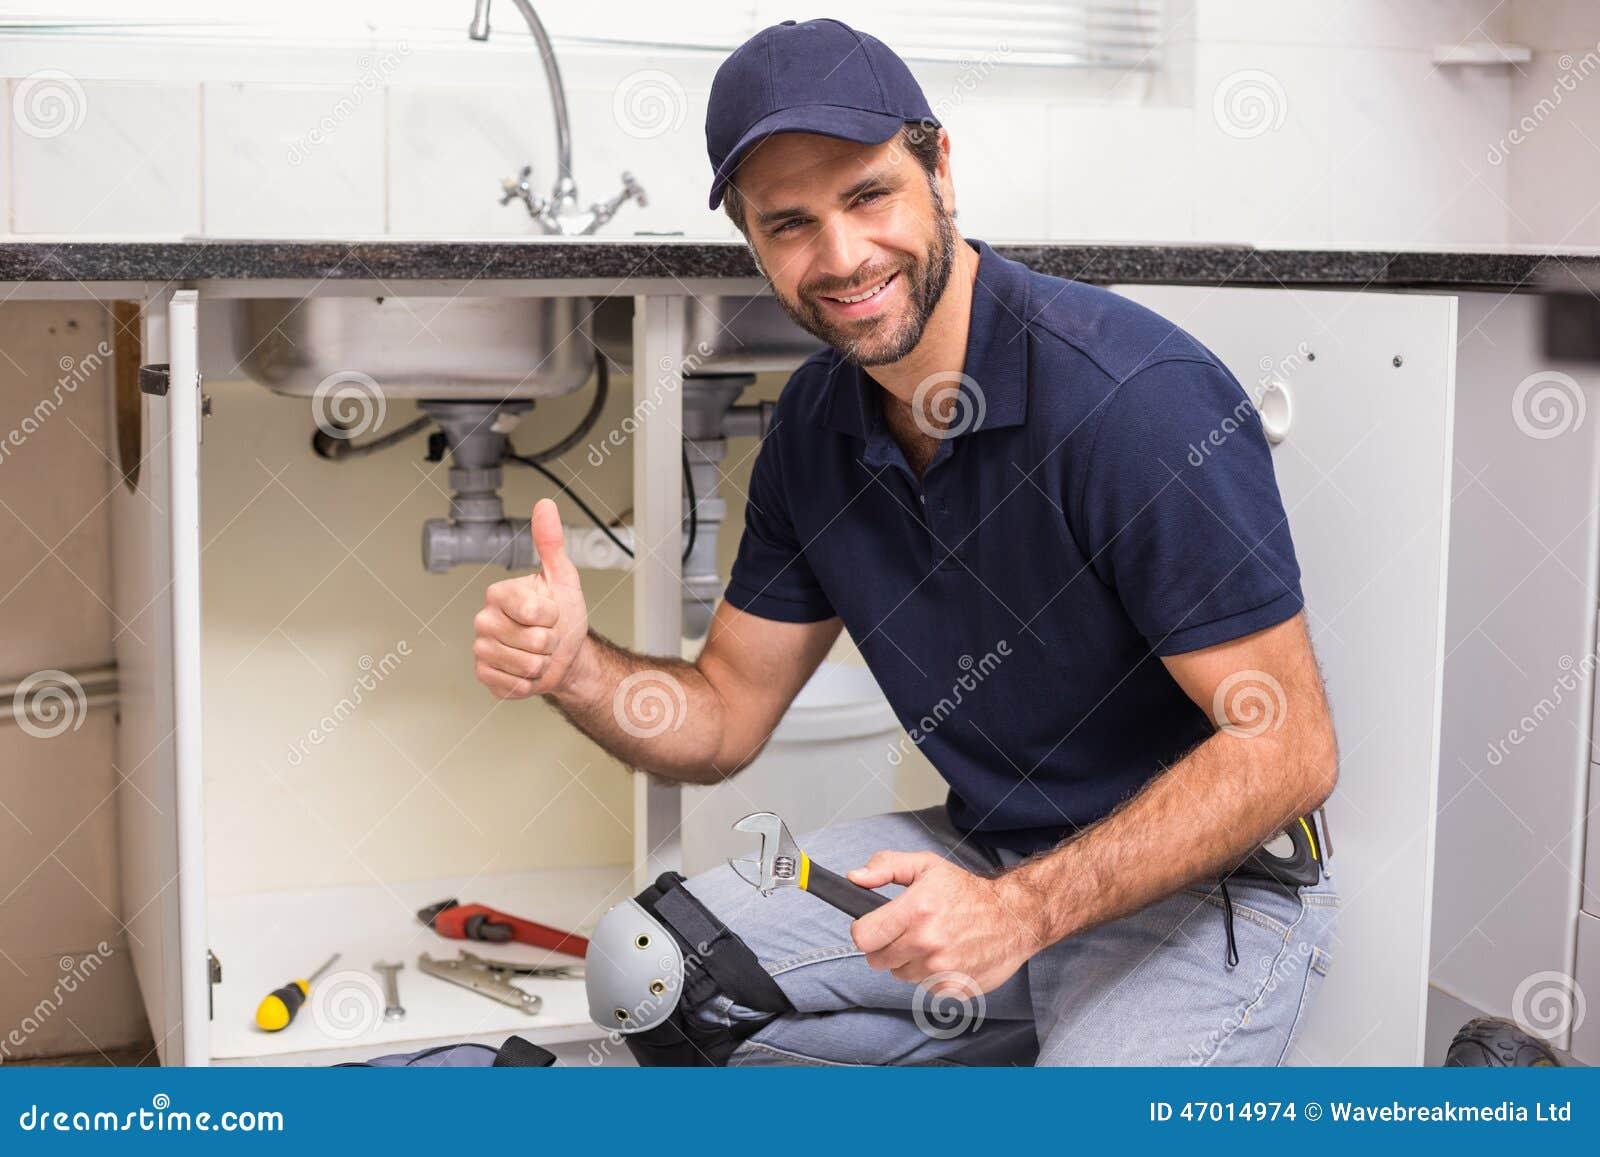 Fixing Pipe Under Kitchen Sink